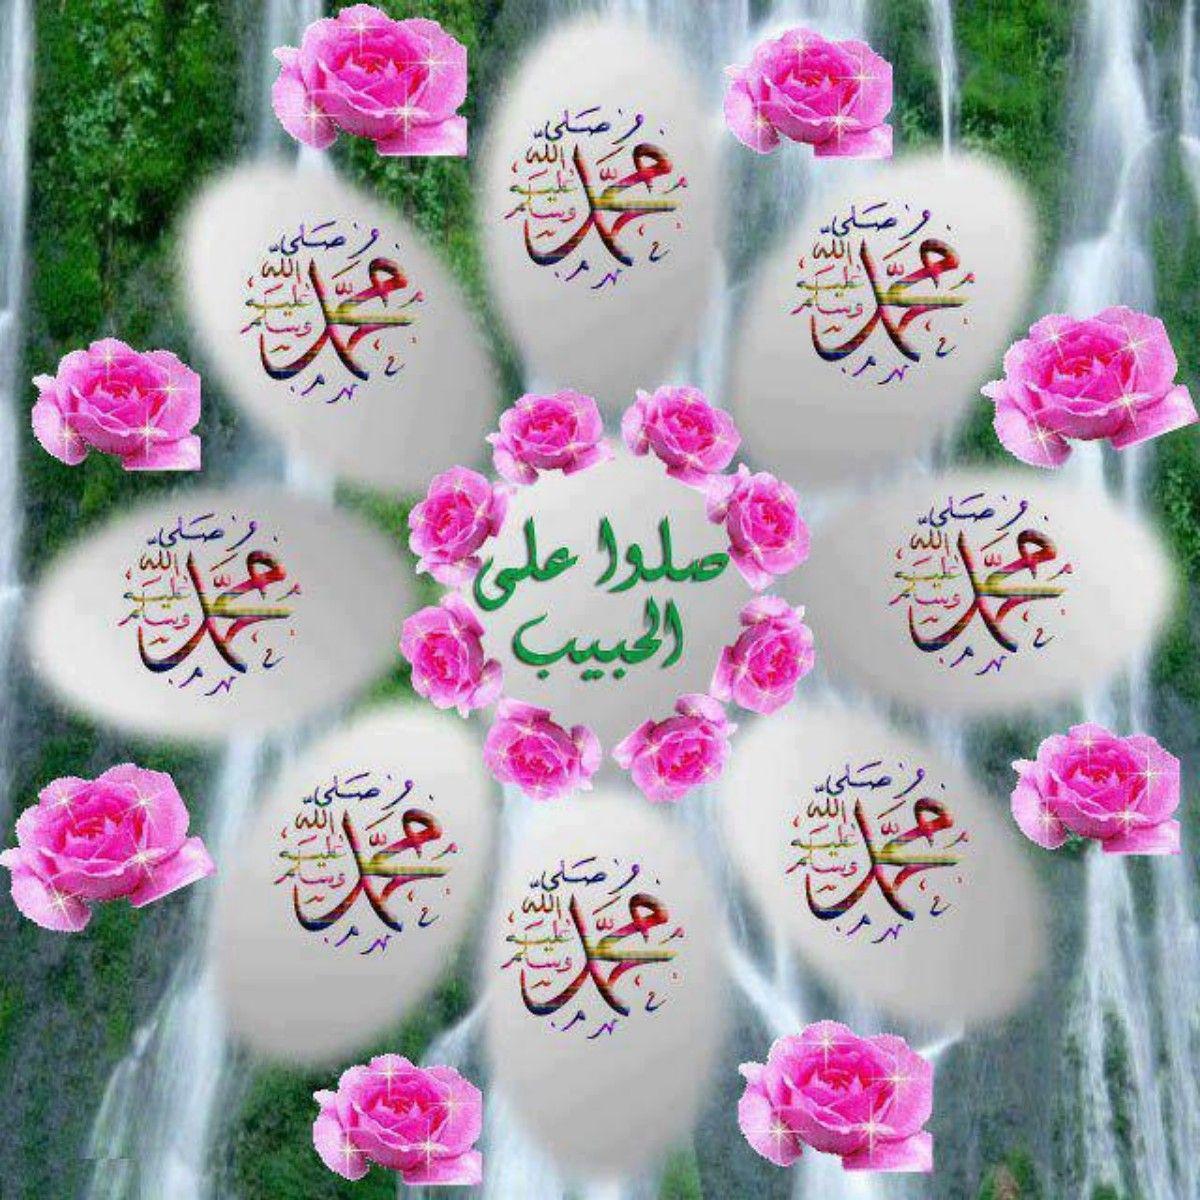 Muslimzon.com #USA online muslim islamic #book store,online #islamic book shop, muslim #childern gift shop  www.muslimzon.com